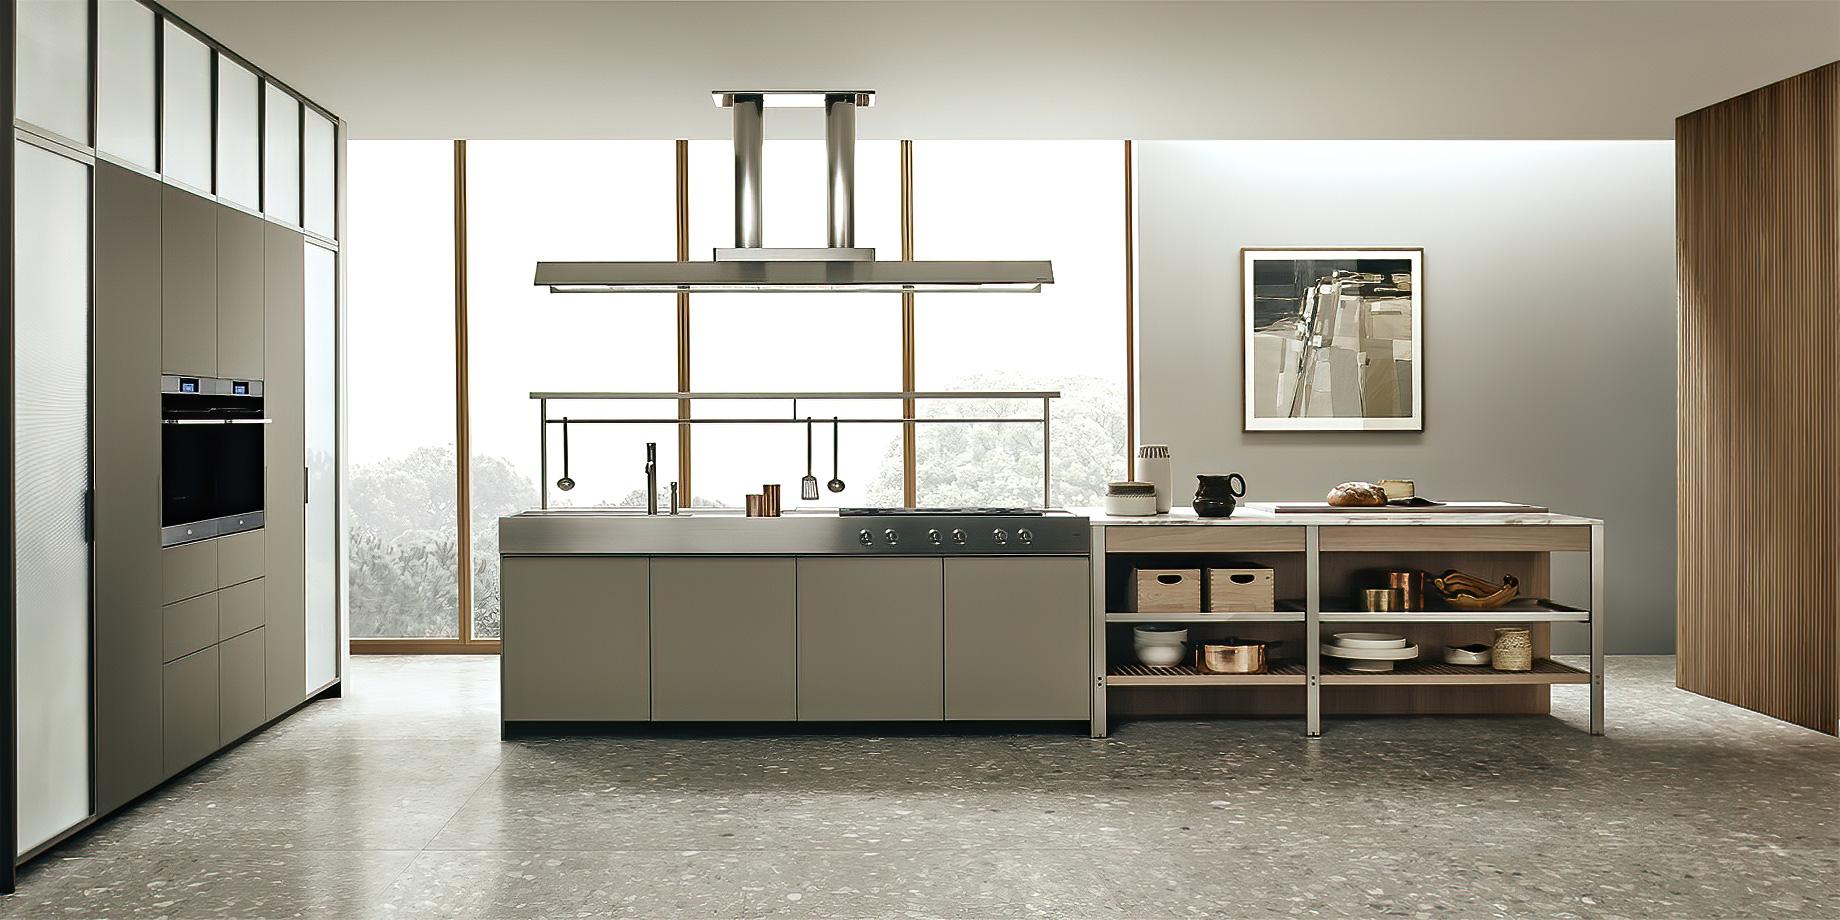 K-lab Contemporary Kitchen Ernestomeda Italy – Giuseppe Bavuso – K-lab Italian Kitchen